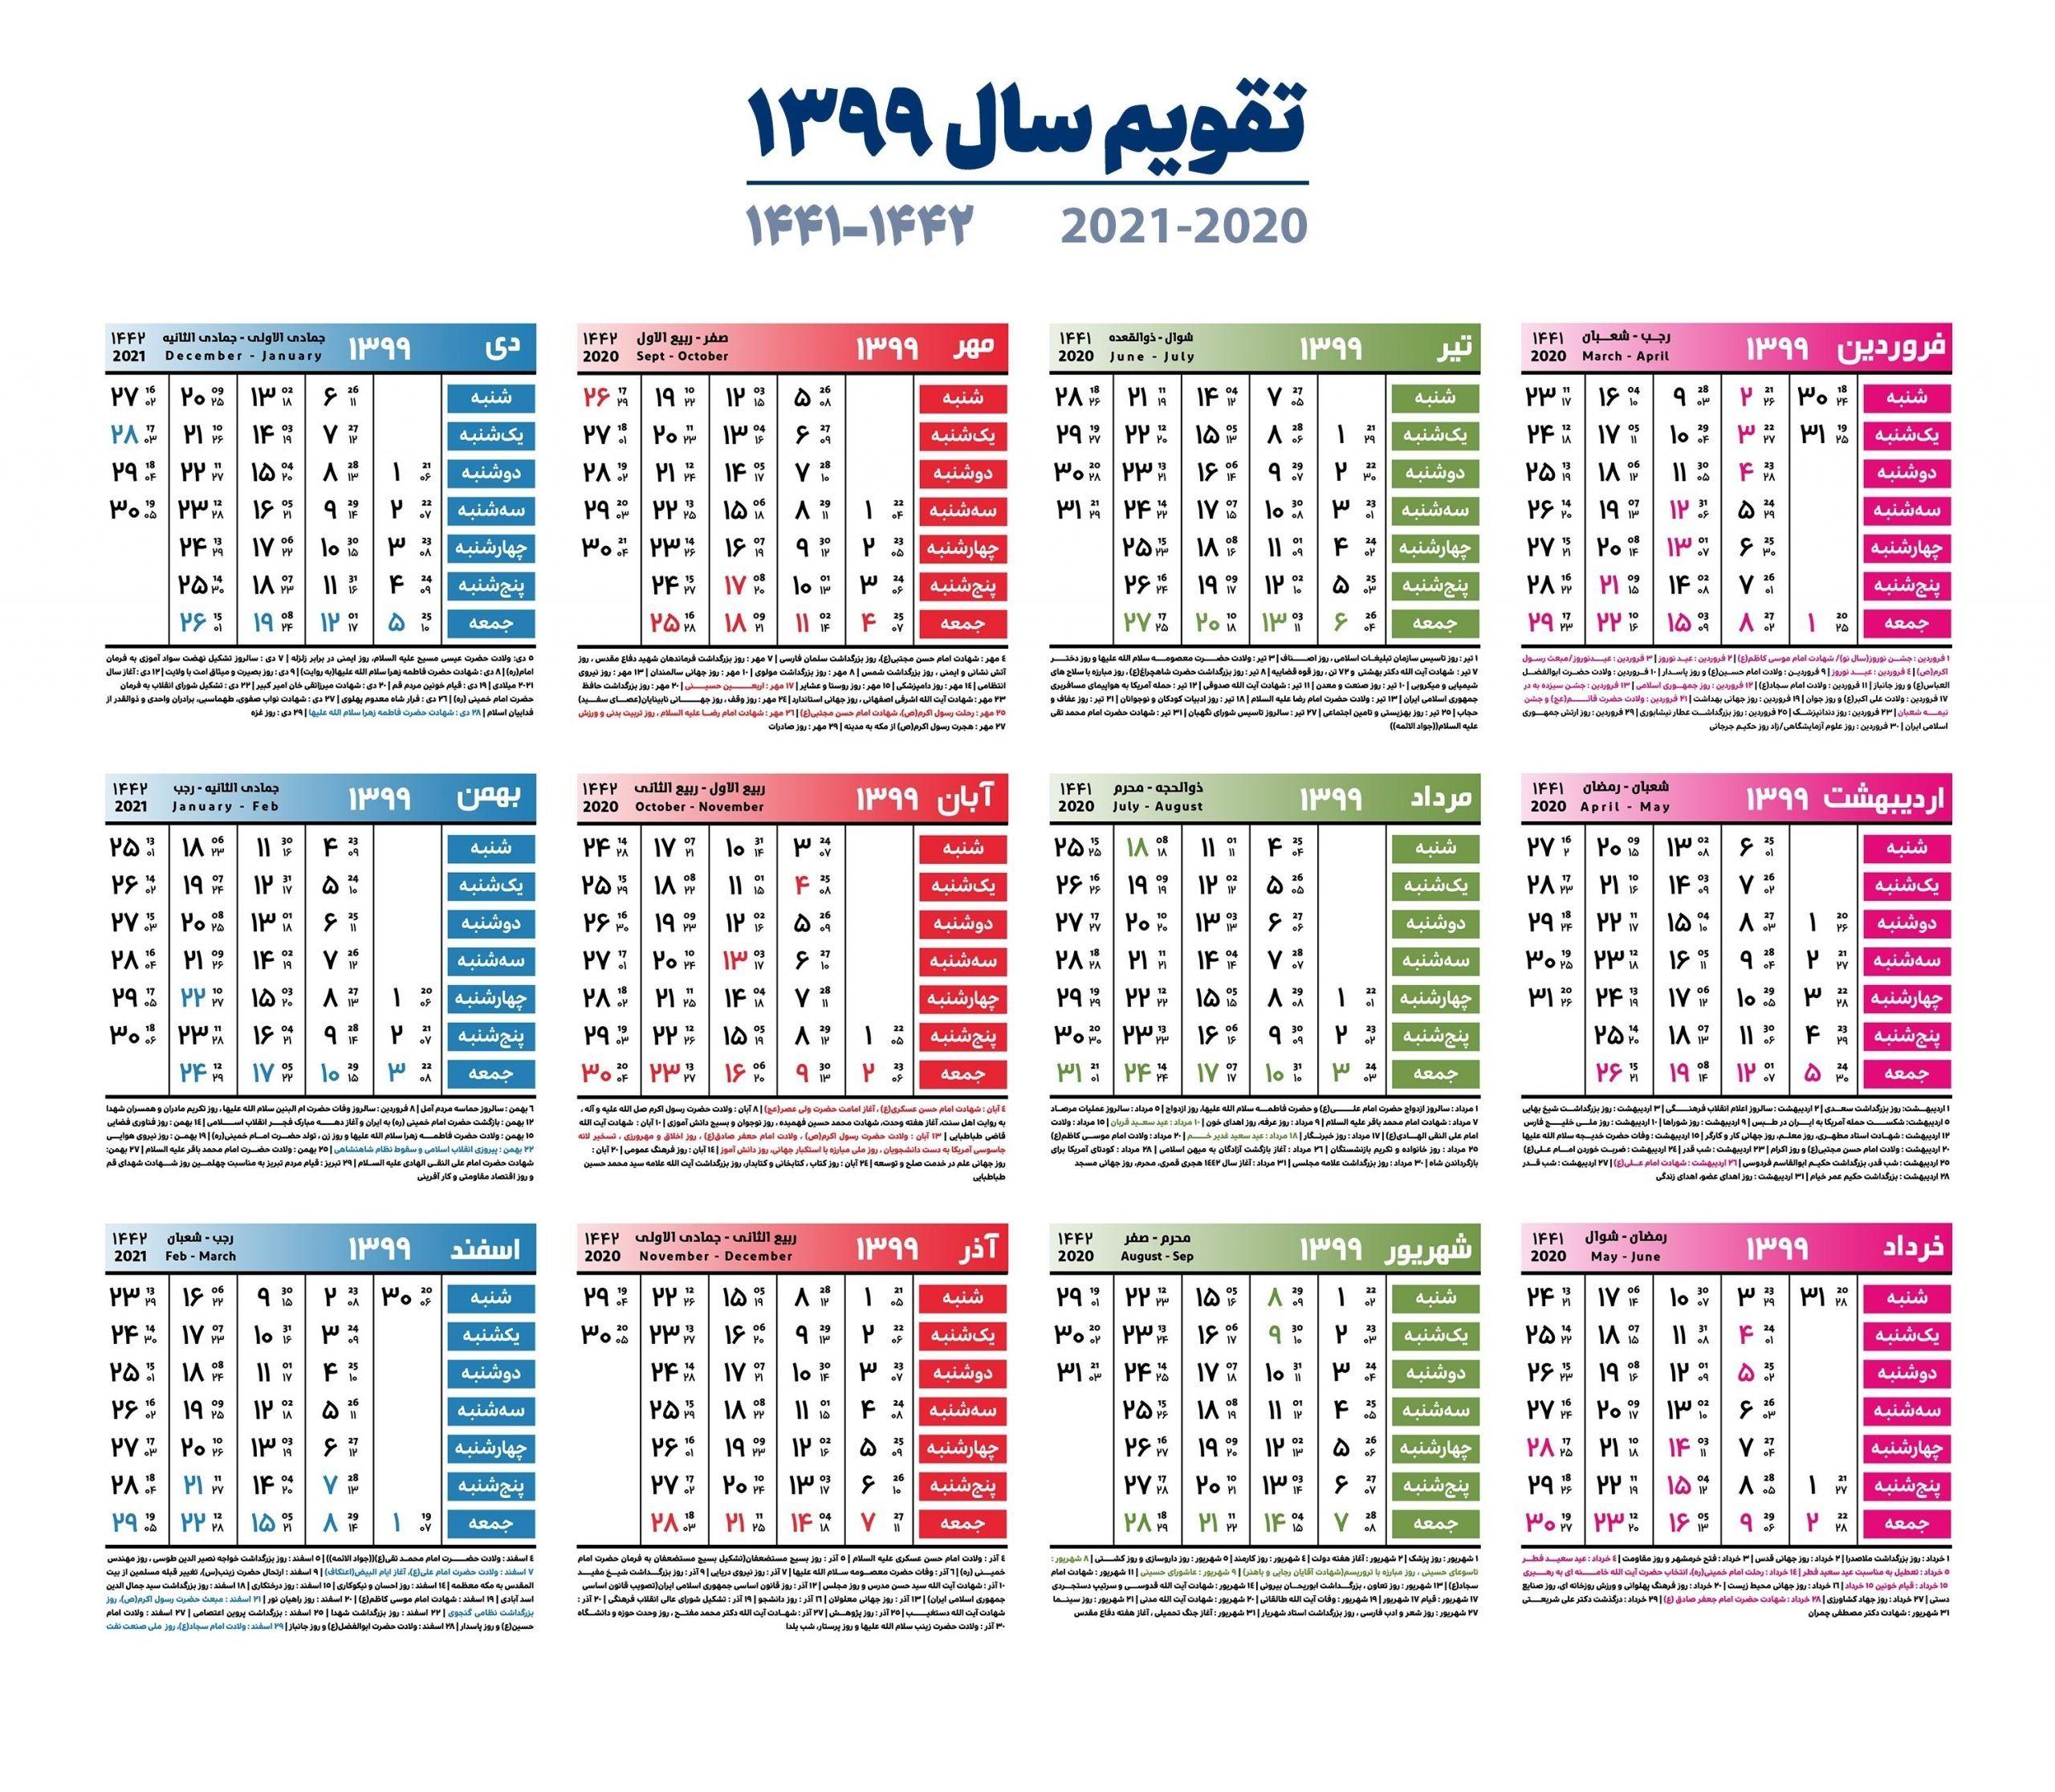 Utk Spring 2022 Calendar.Julian Vs Gregorian Calendar 2021 Printable Calendar